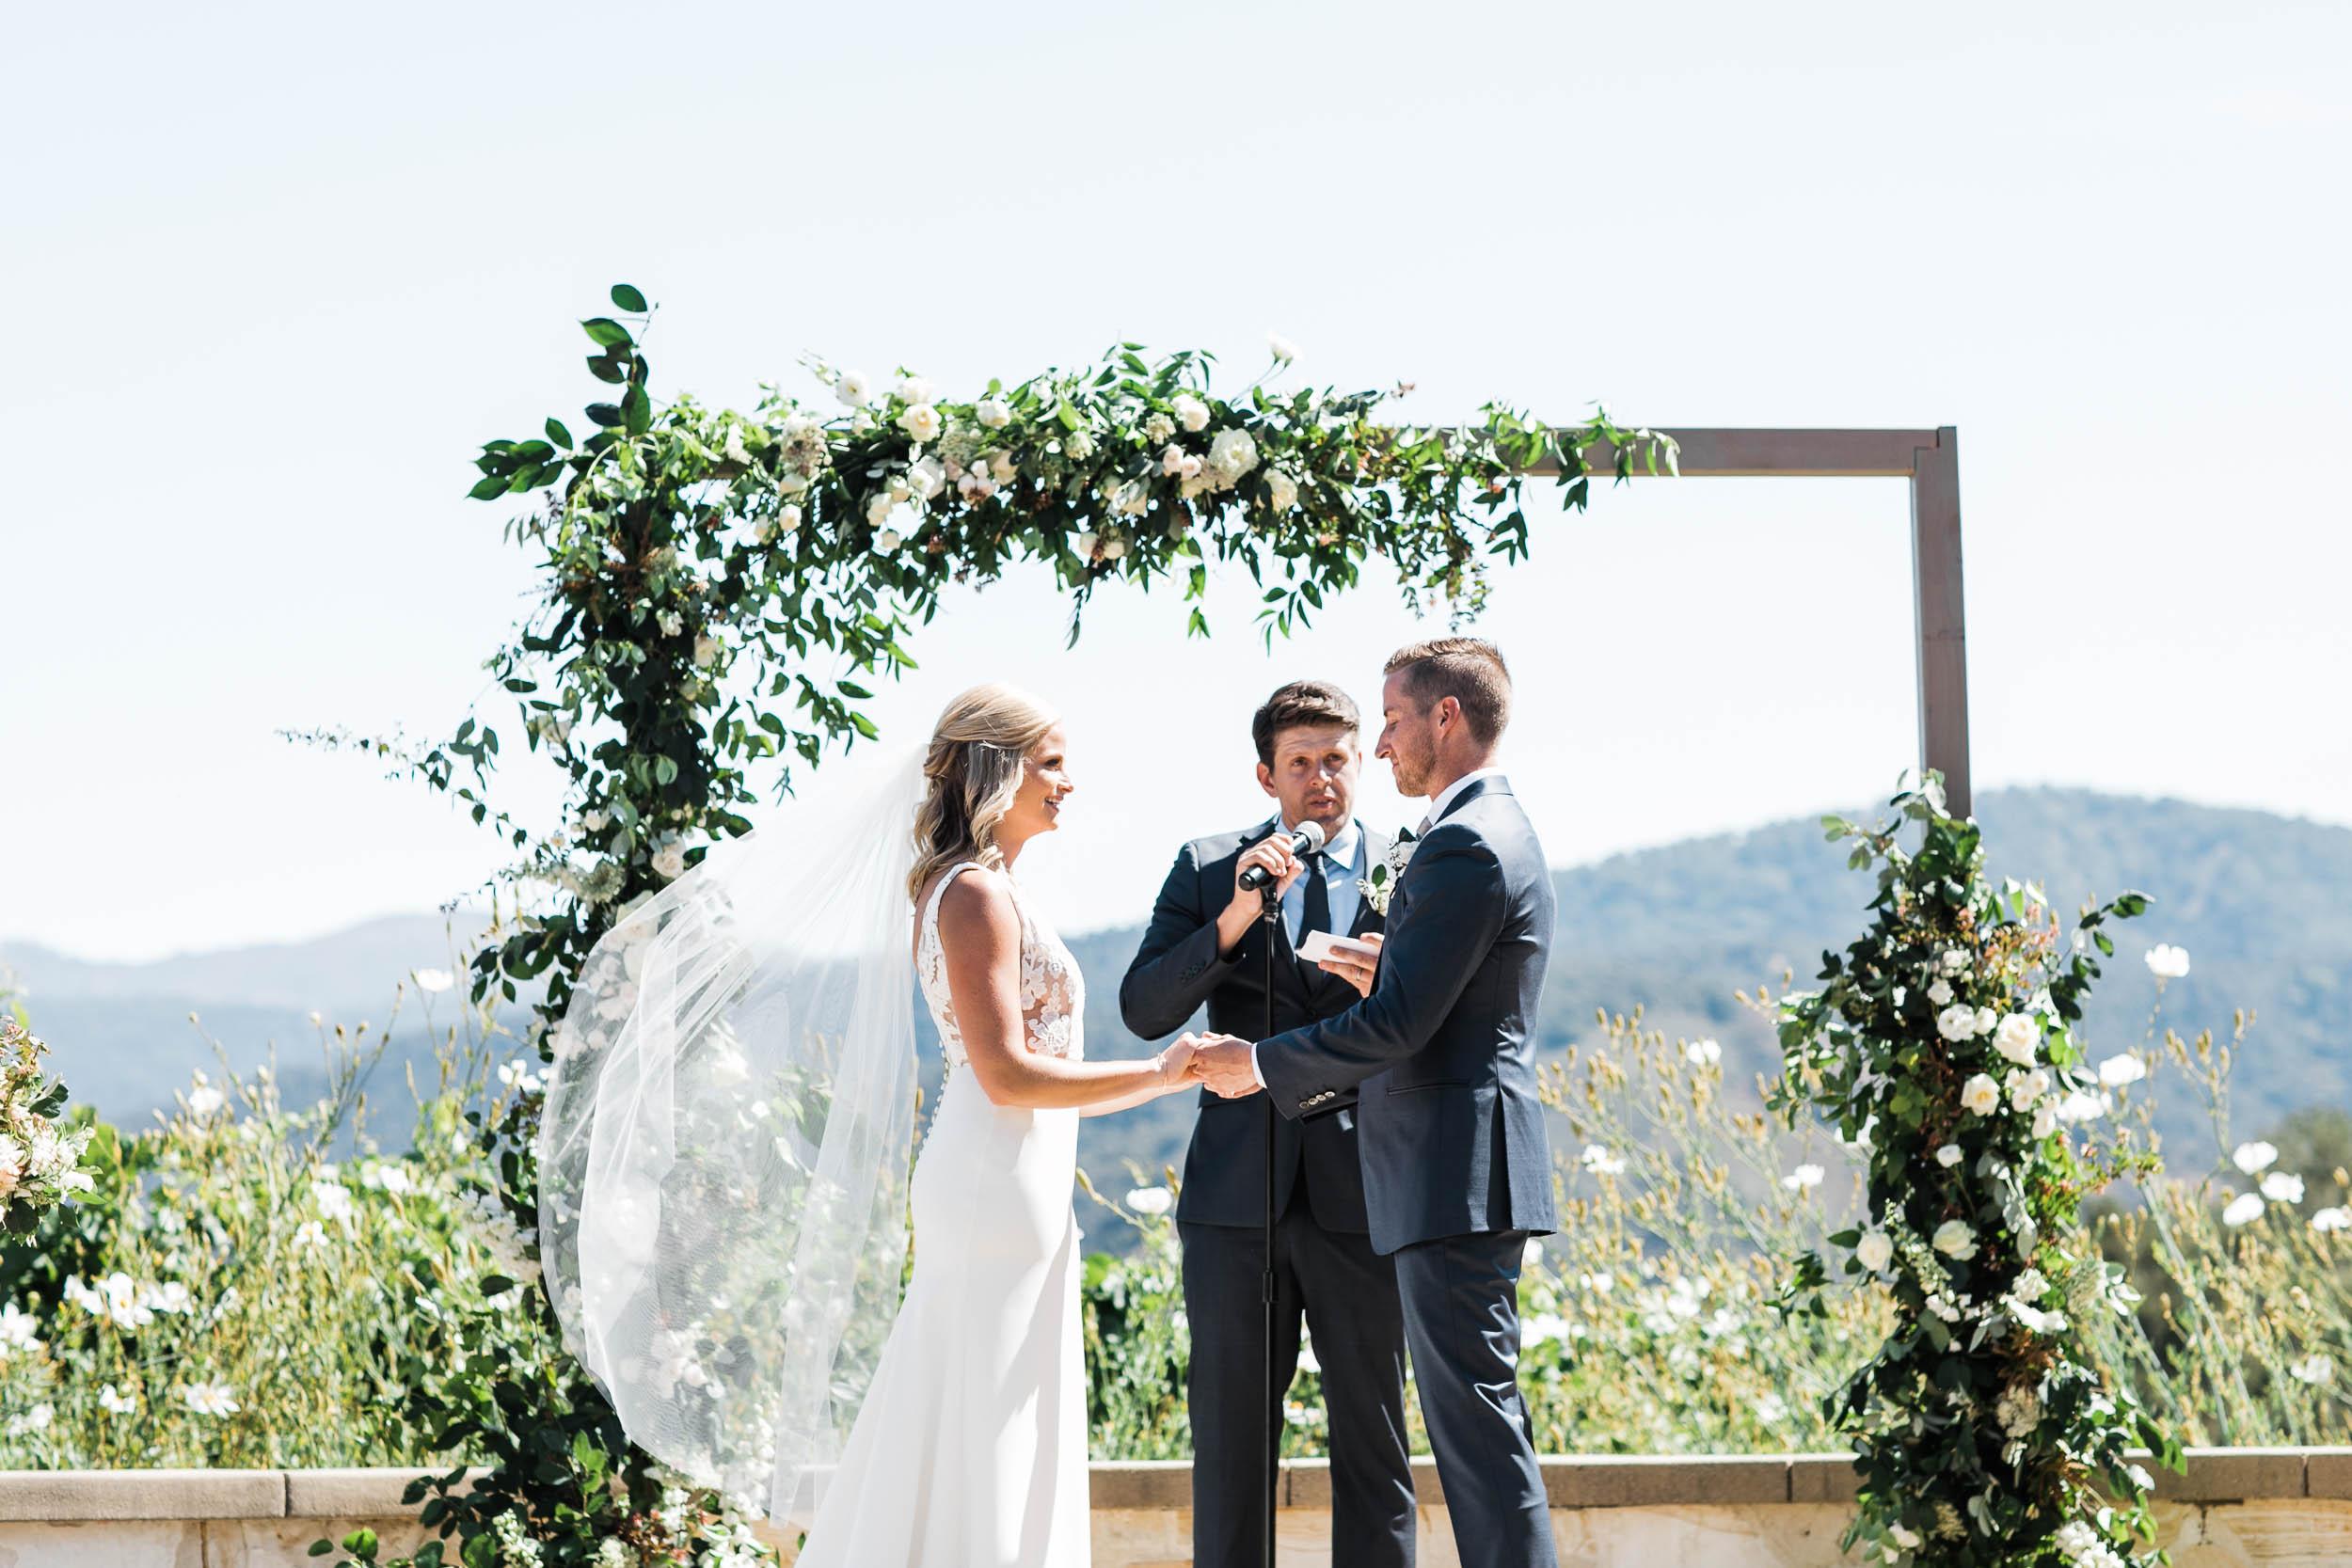 048_072118_D+K_Holman Ranch Wedding_Buena Lane Photography_0711ER copy.jpg